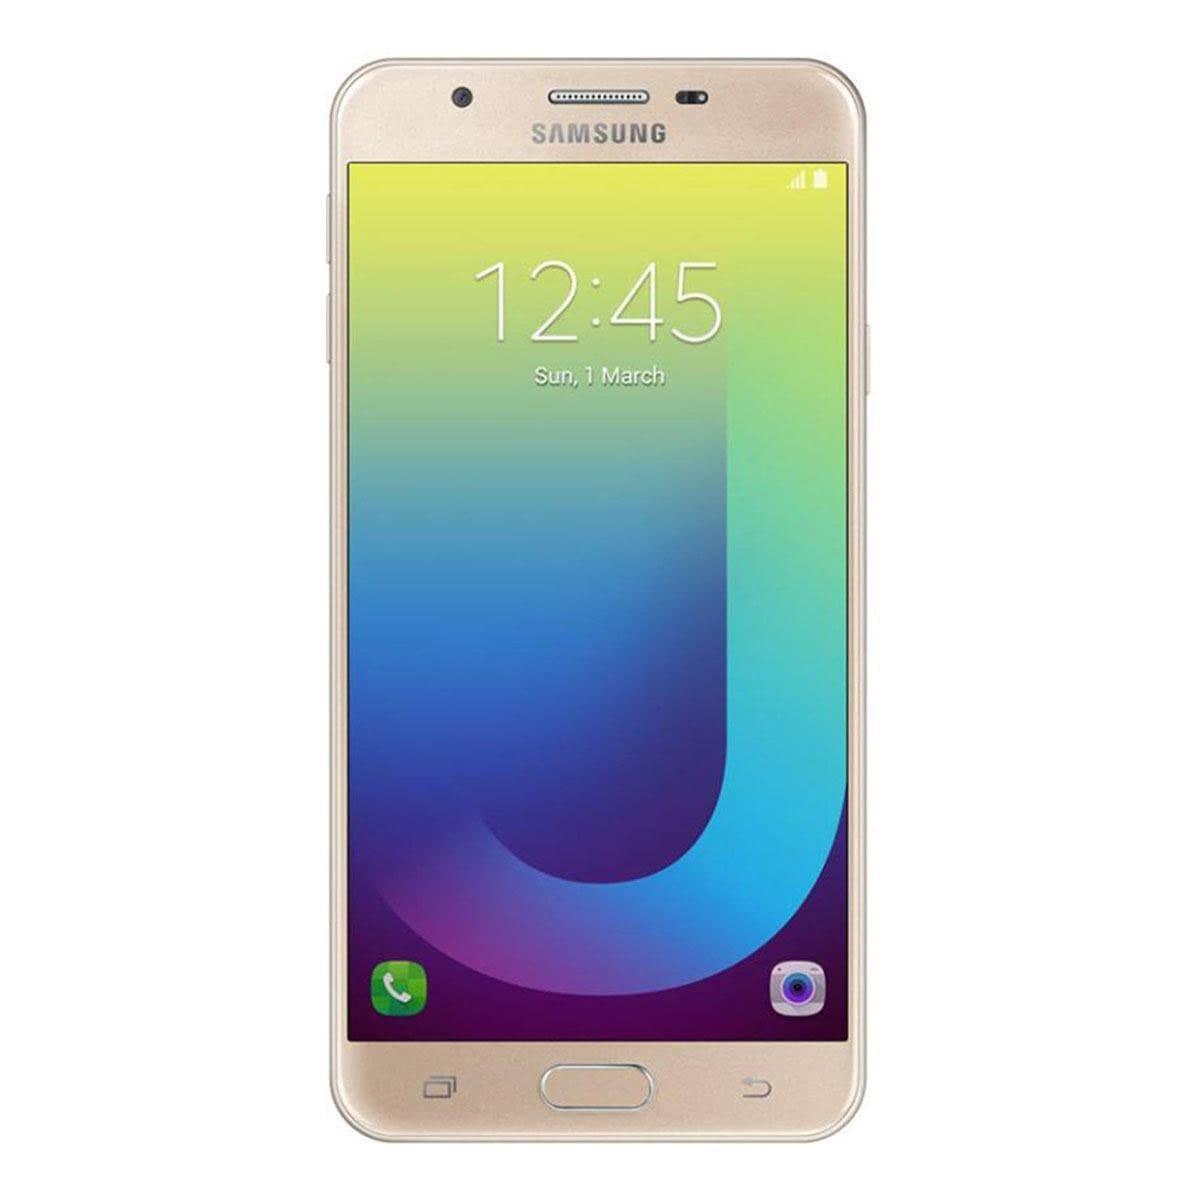 1ecafef48f3 Samsung J7 Prime 2 - Smartphone - 5.5 Inch - 3GB RAM - 32GB ROM -